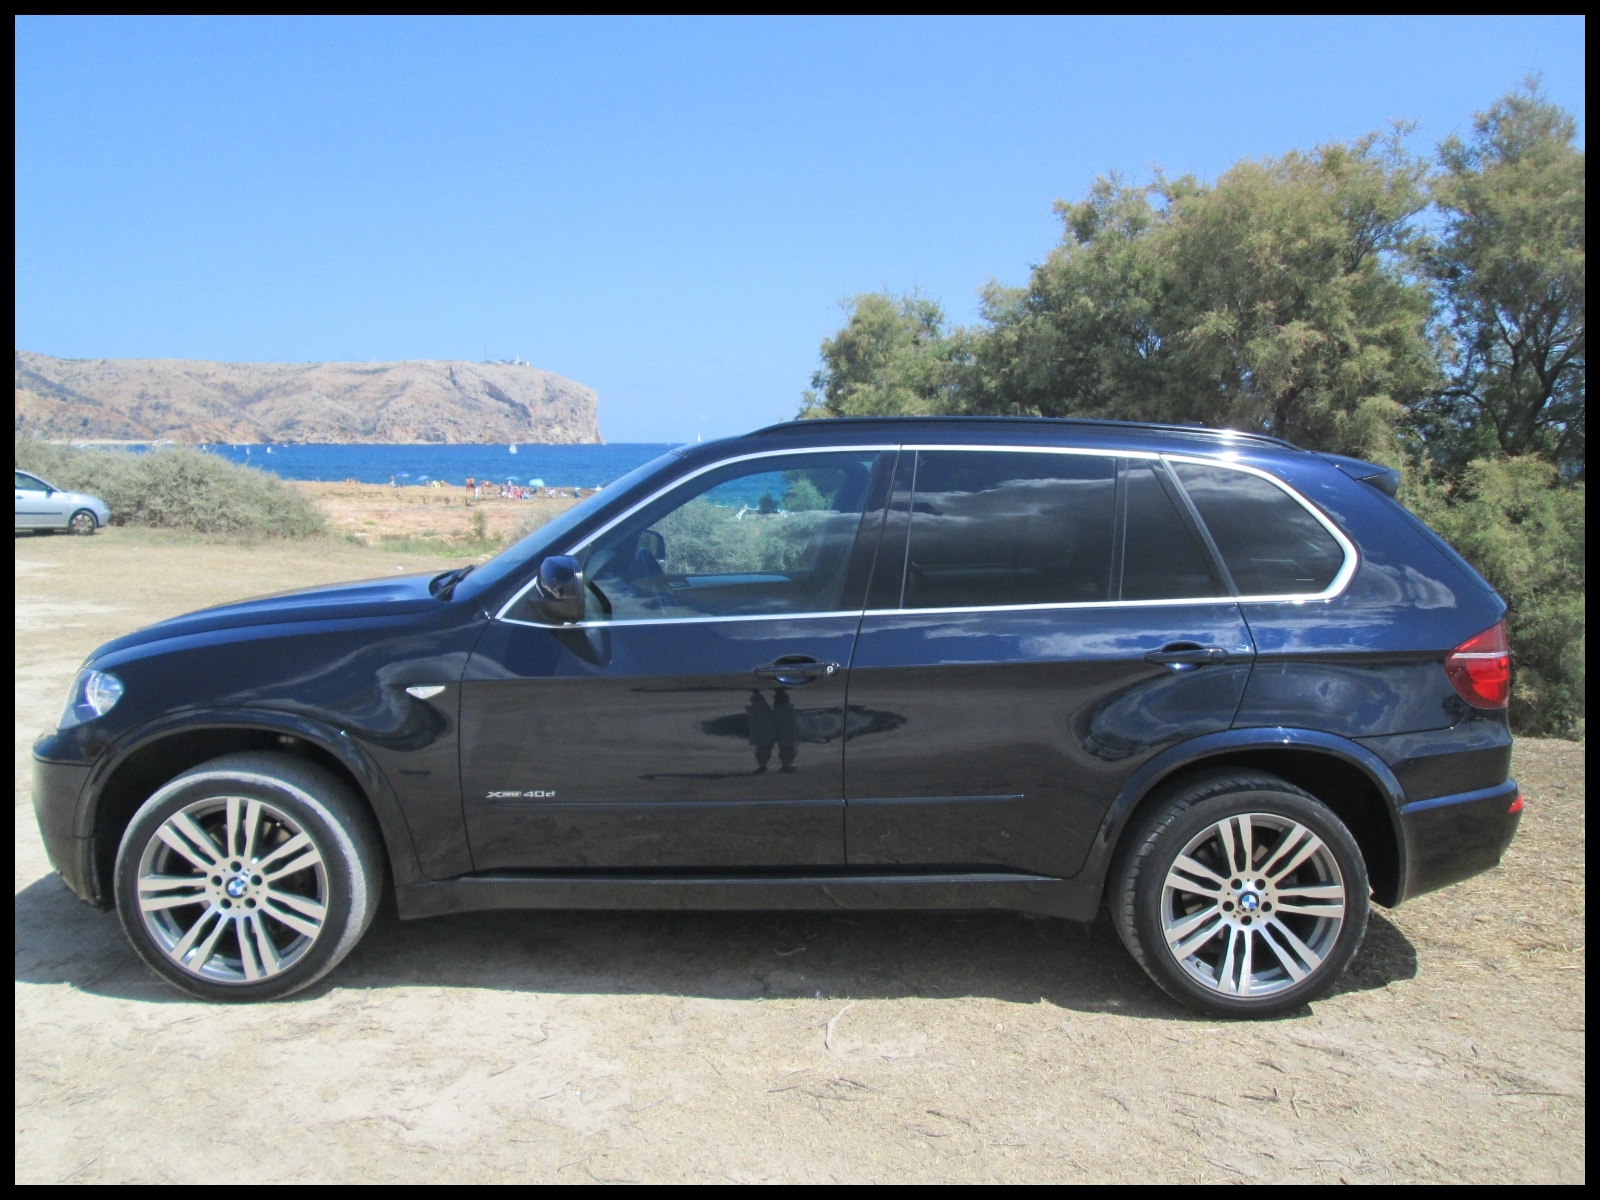 Bmw X5 Diesel Reliability Elegant Bmw X5 X Drive 4 0d for Sale In Javea Costa Blanca Spain